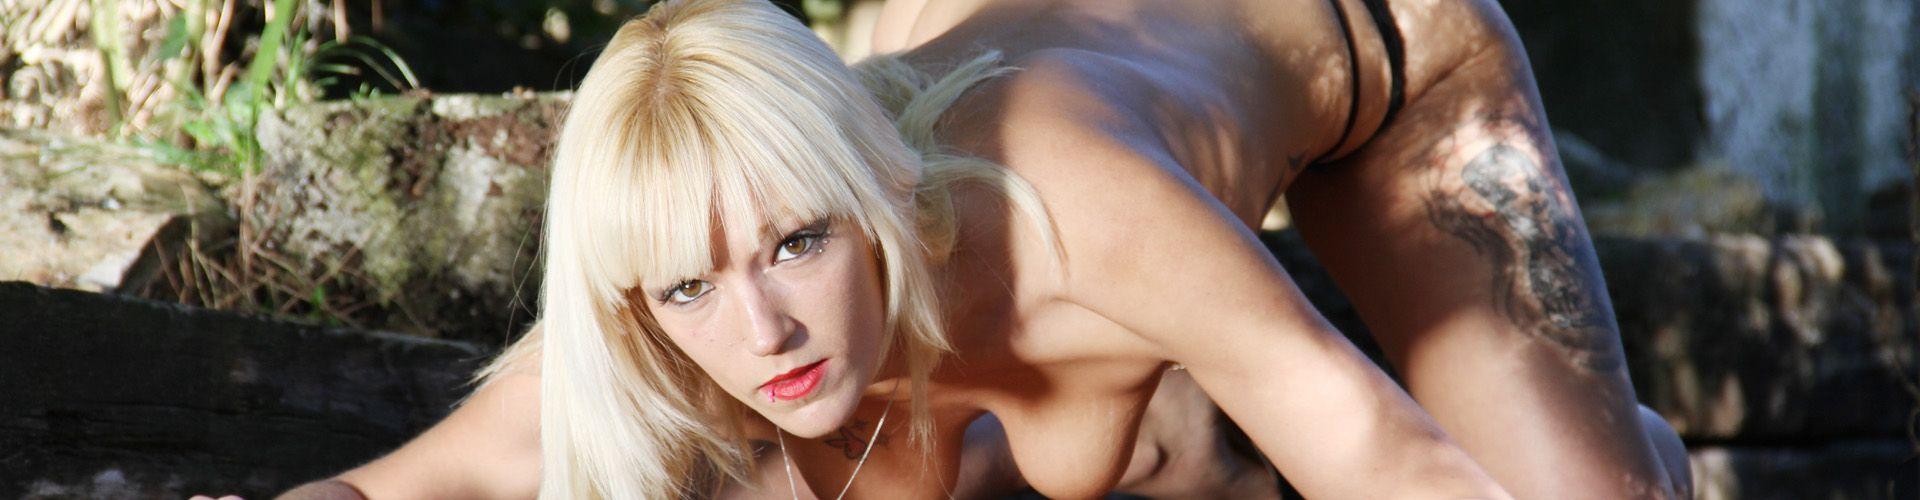 Stefani Tarrago Free sexy photo gallerie